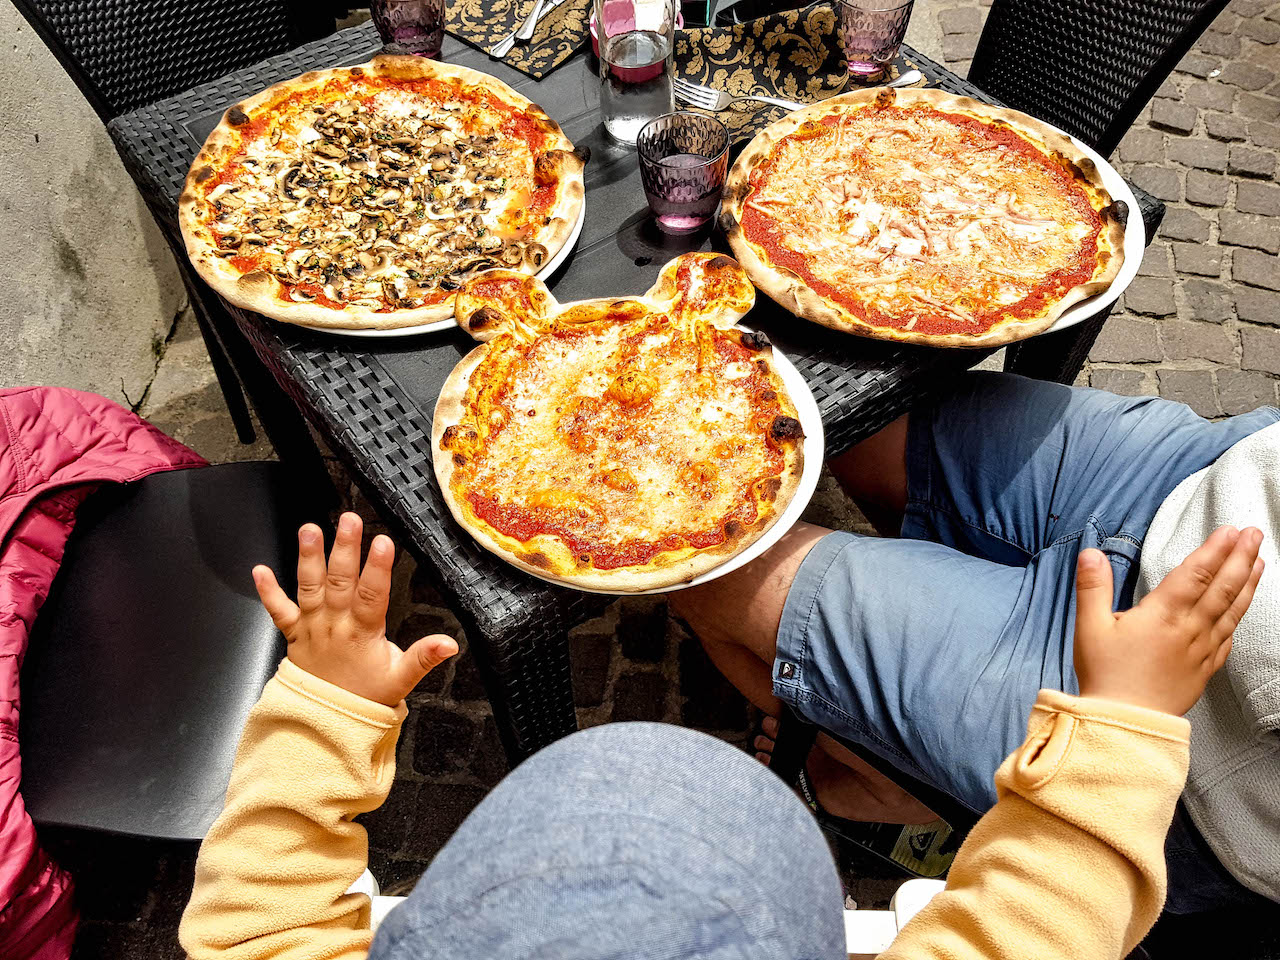 In Oristano freut sich jemand über Pizza!